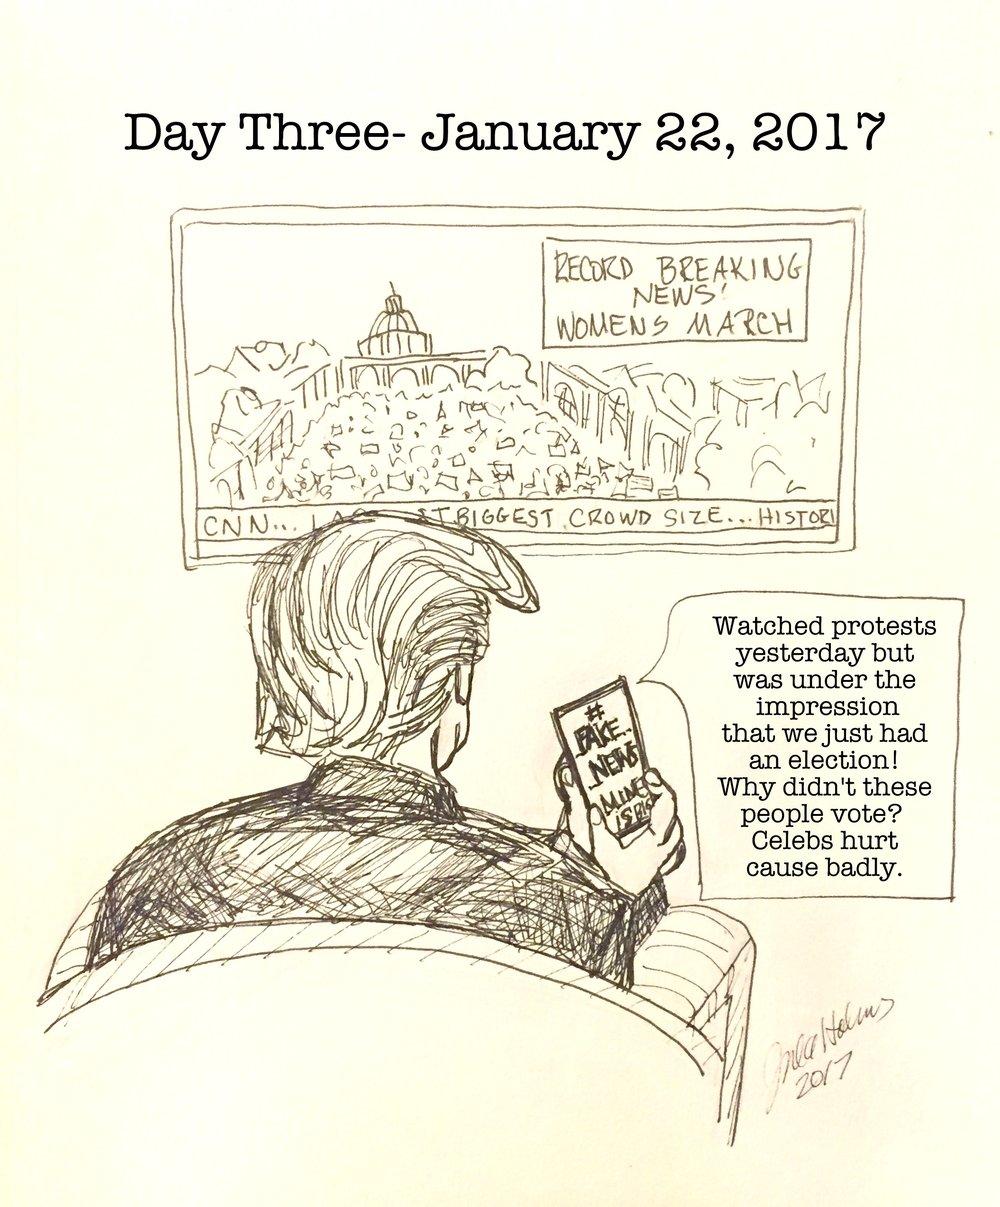 Day 3- January 22, 2017, Copyright 2017